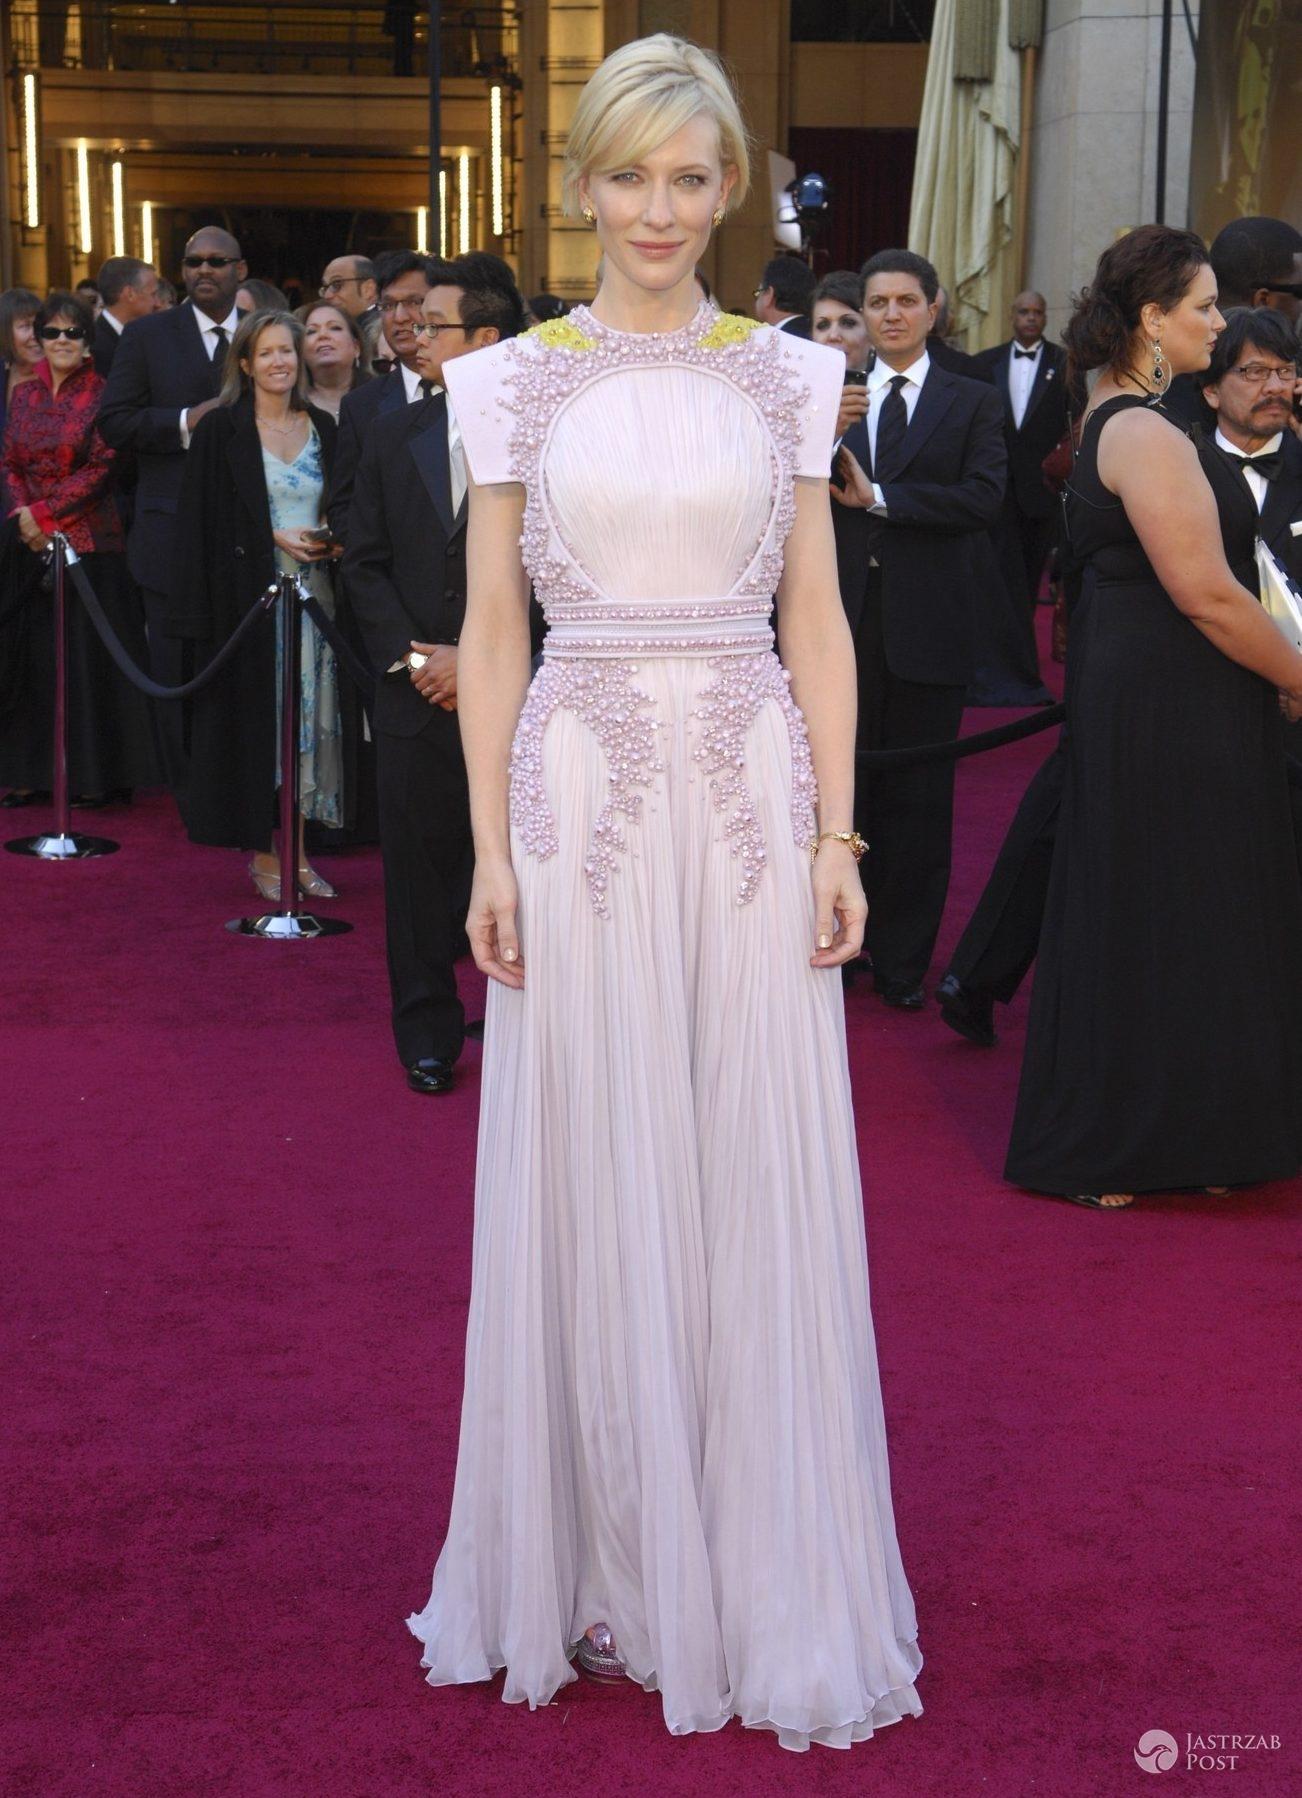 Kreacja: Givenchy. Cate Blanchett, Oscary 2011 (fot. East News)